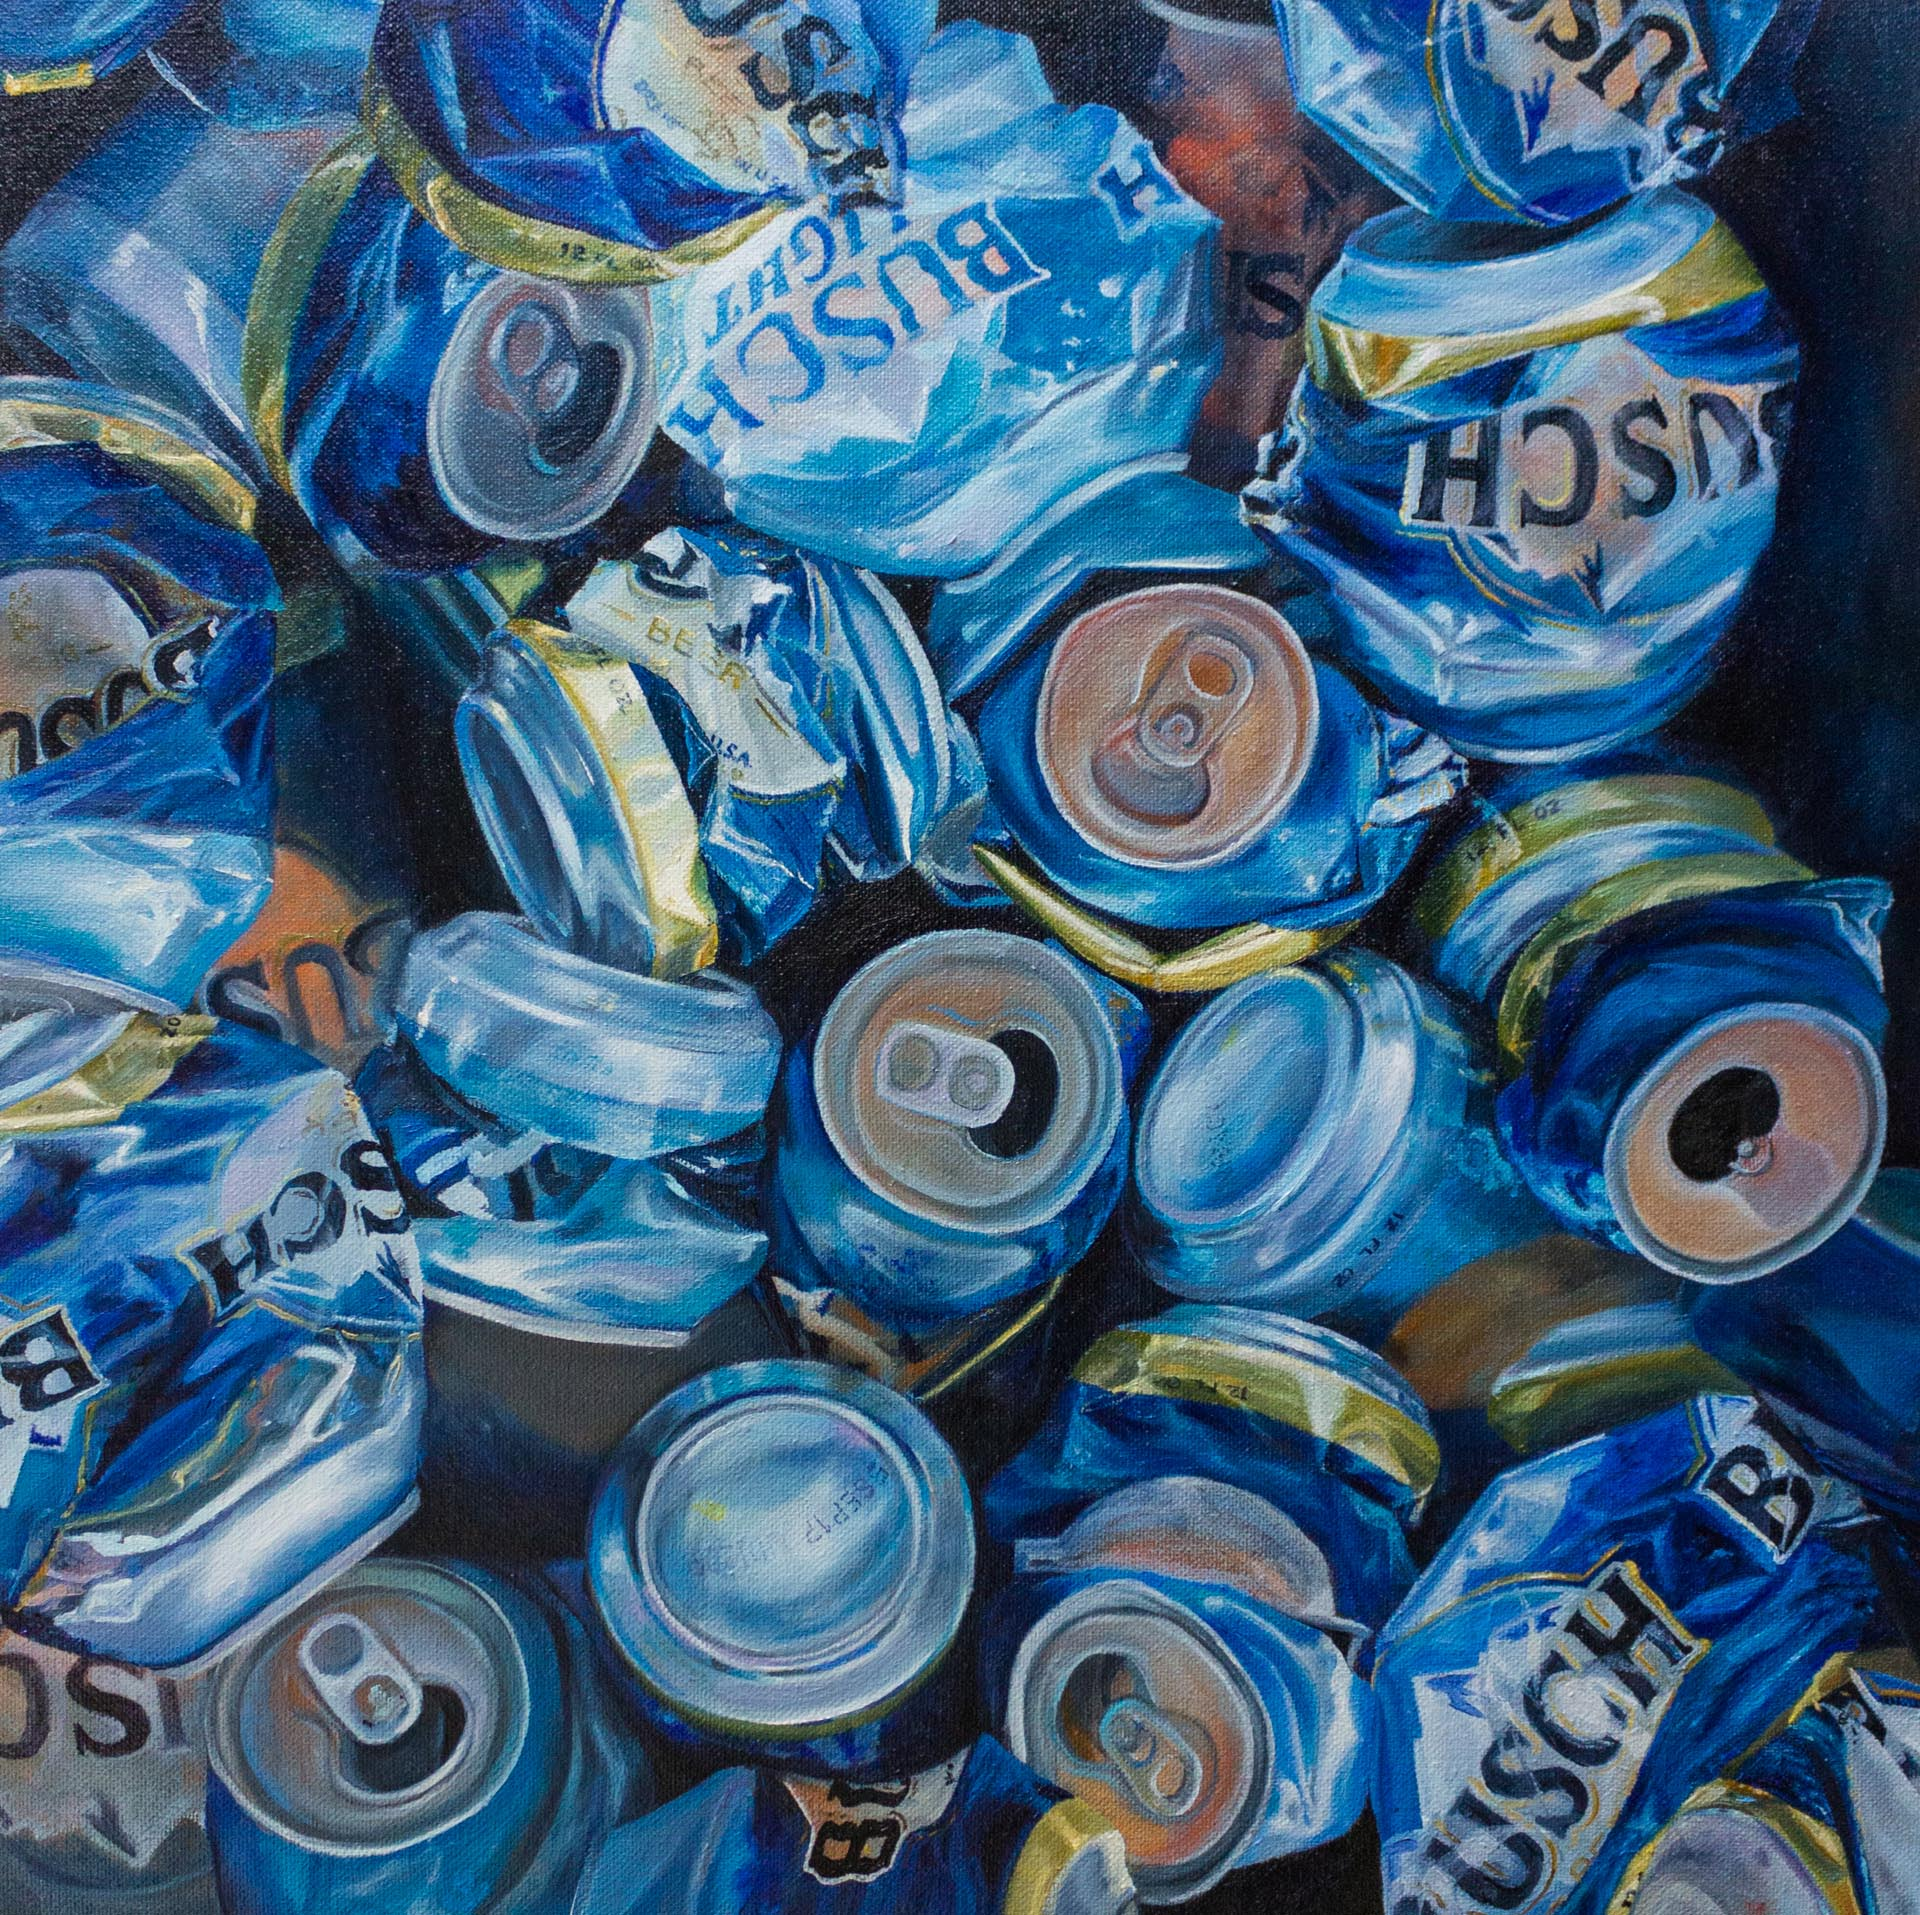 Nancy Drinks Busch, 2017, Oil on Canvas, 15x15